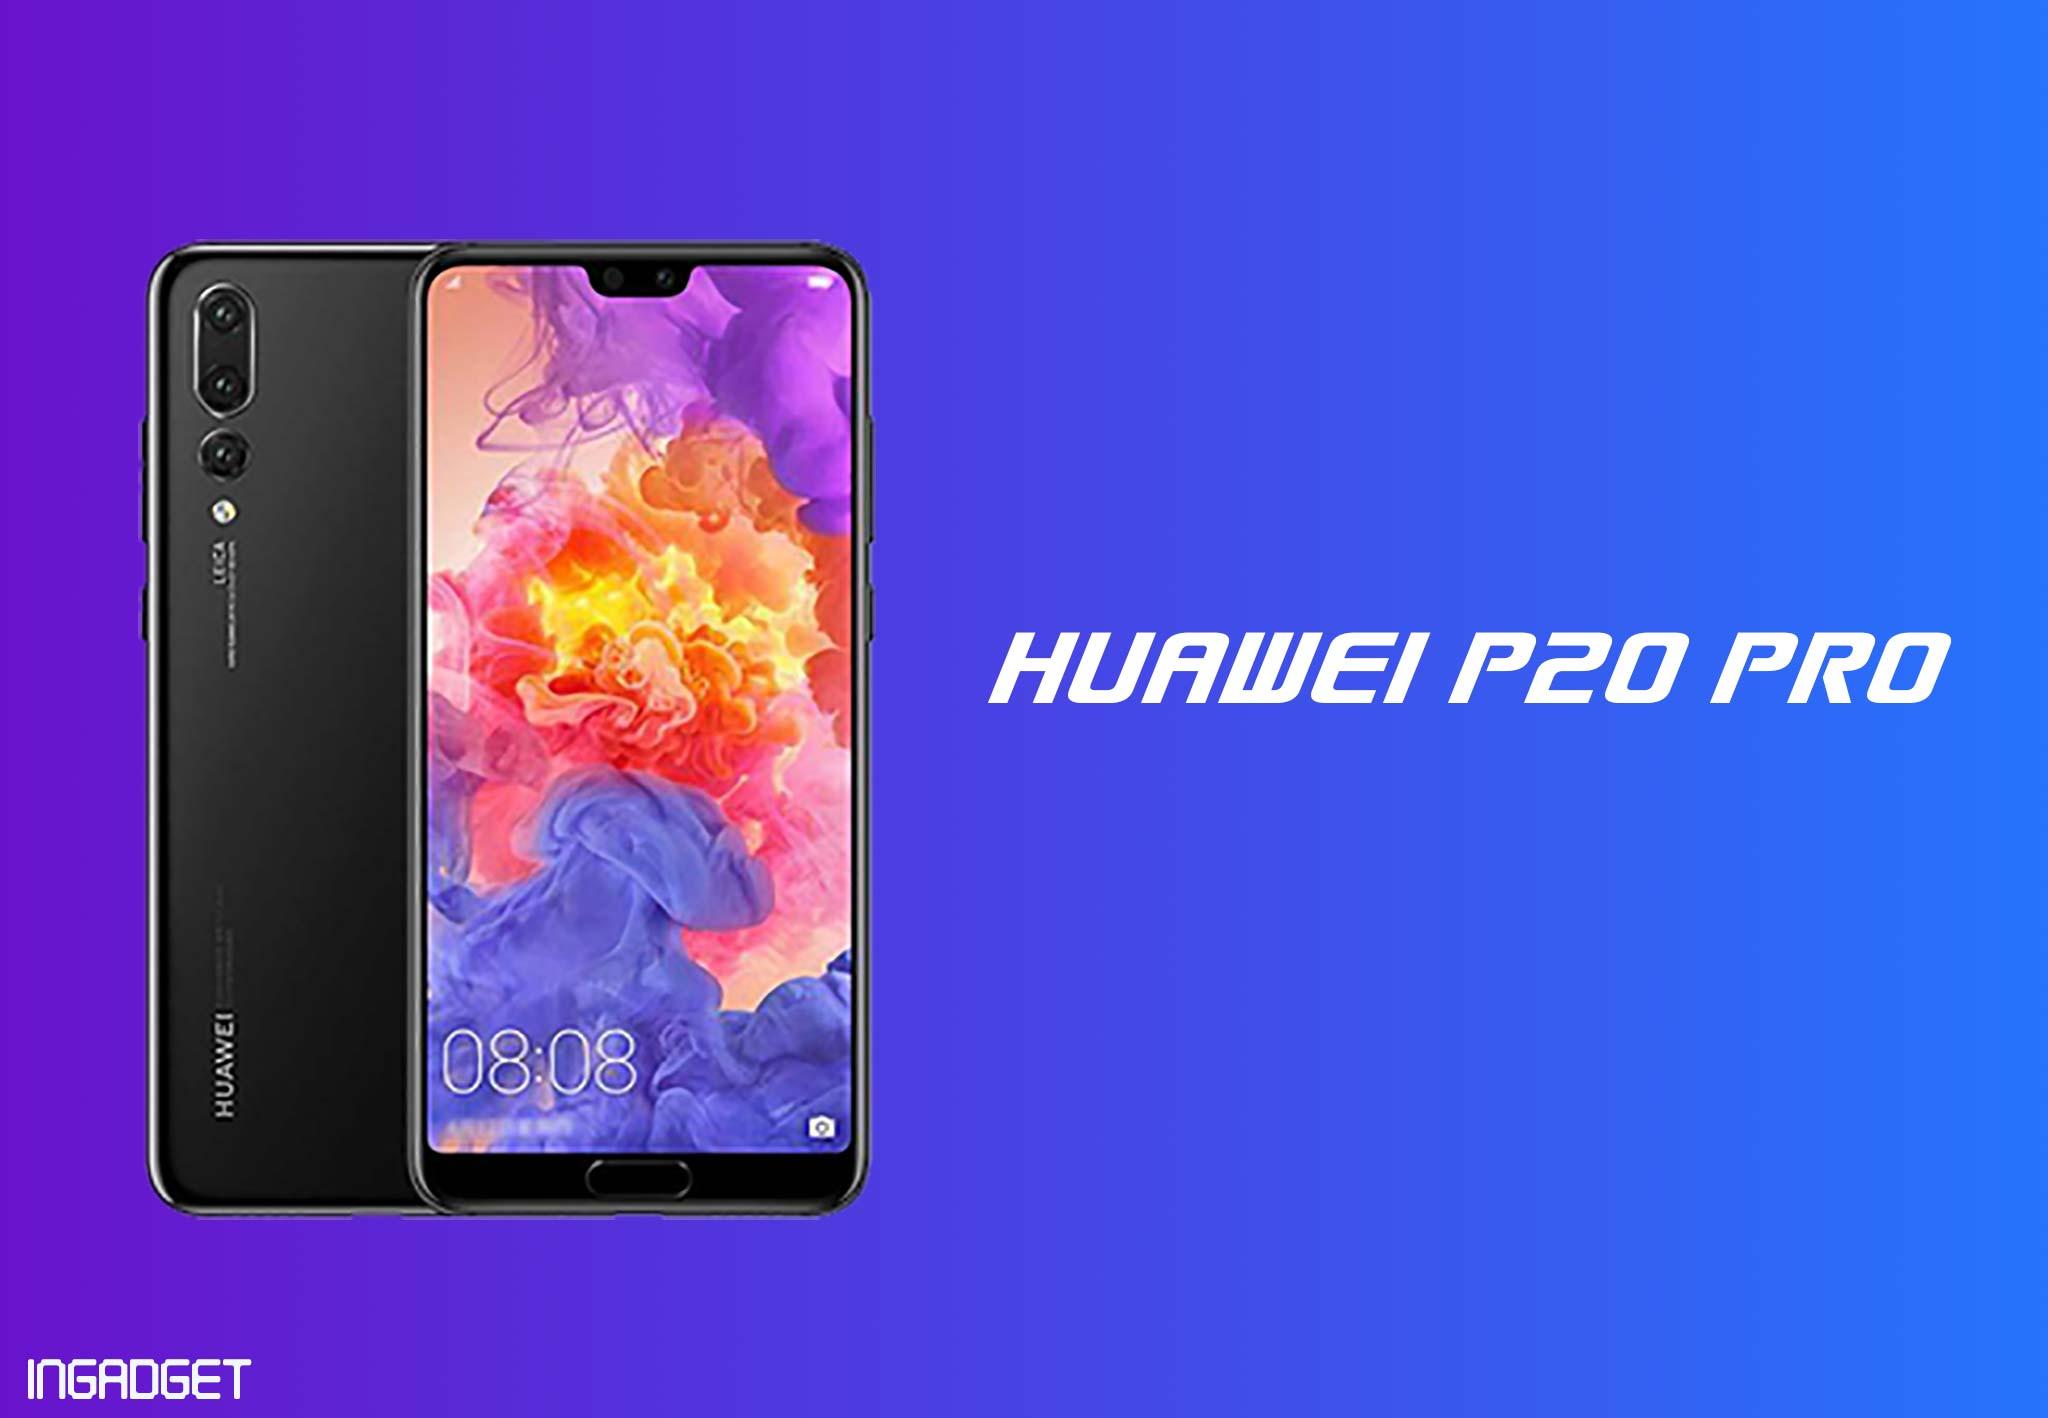 Huawei P20 Pro Price in Nepal